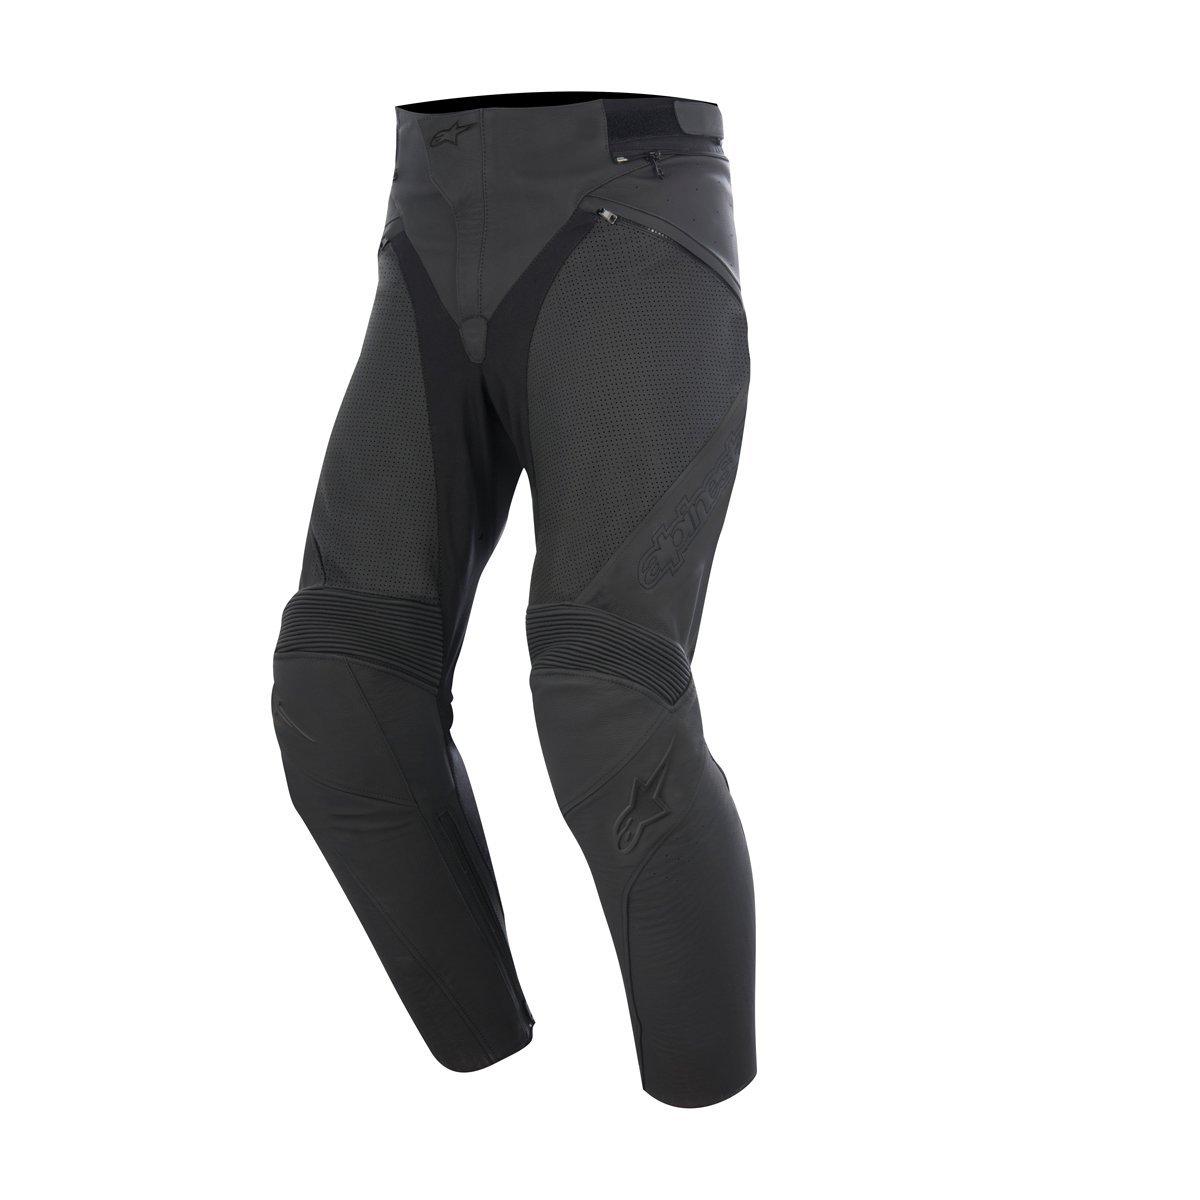 Alpinestars Jagg Airflow Men's Sports Bike Motorcycle Pants - Black/Black / Size 44